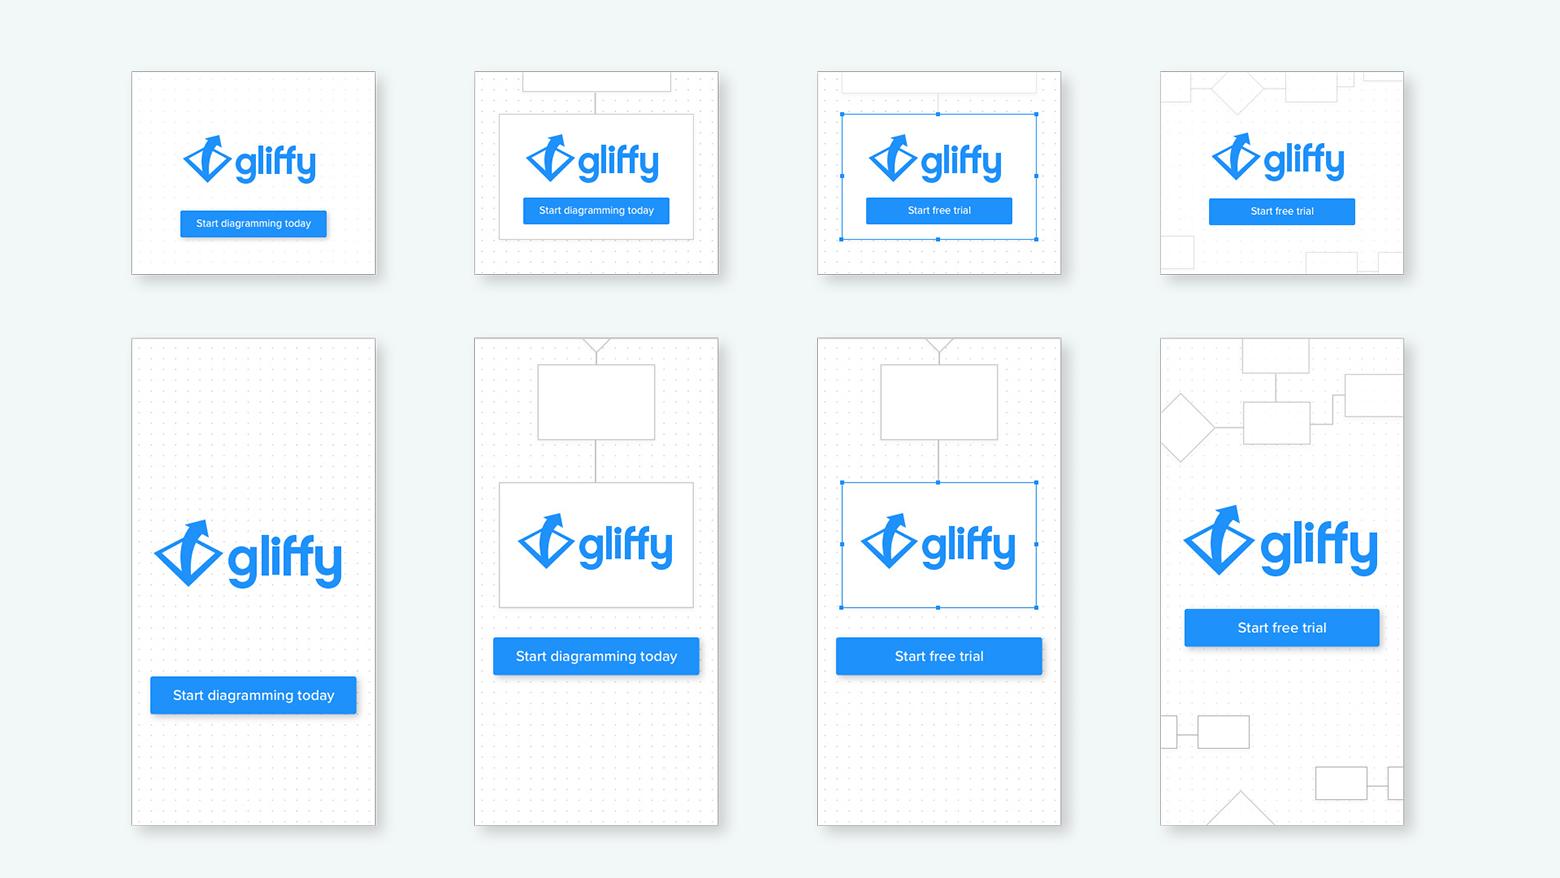 Gliffy-Ads-2